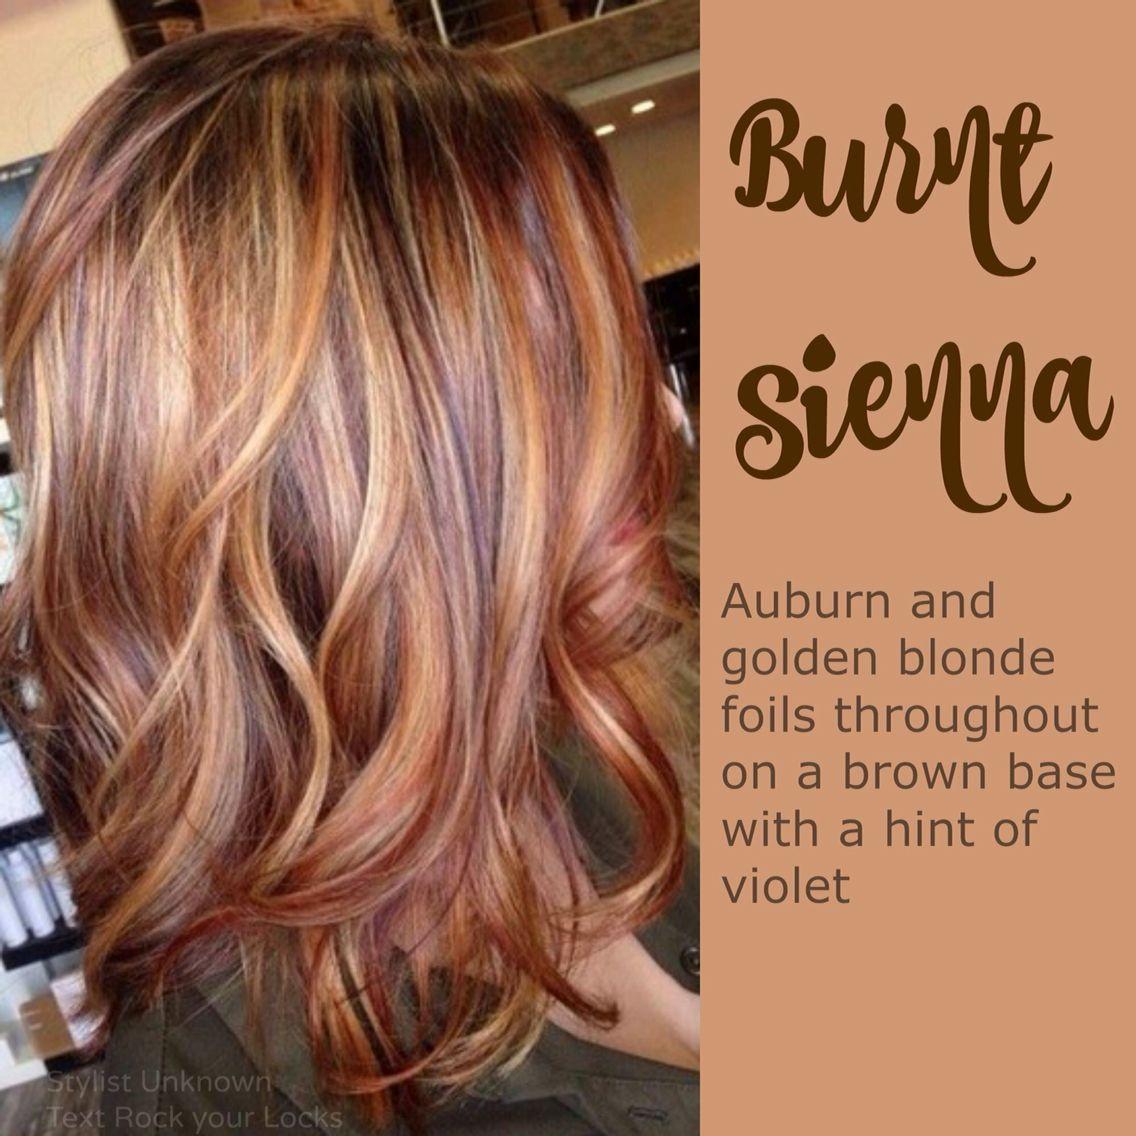 Fall Hair Color 2015 Burnt Sienna Auburn, Golden Blonde, Violet More